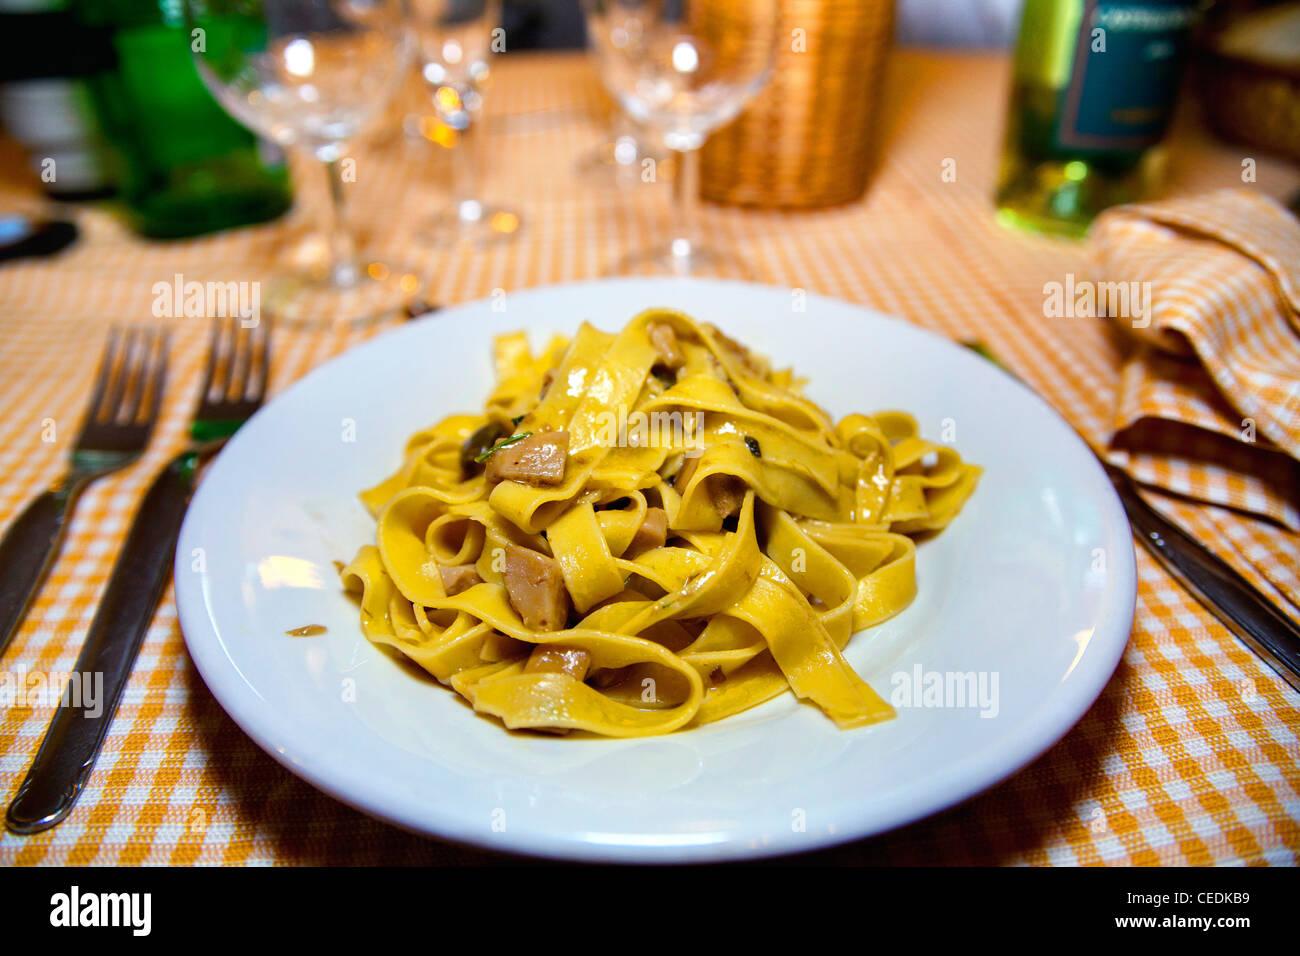 Fettuccine with mushrooms - Stock Image